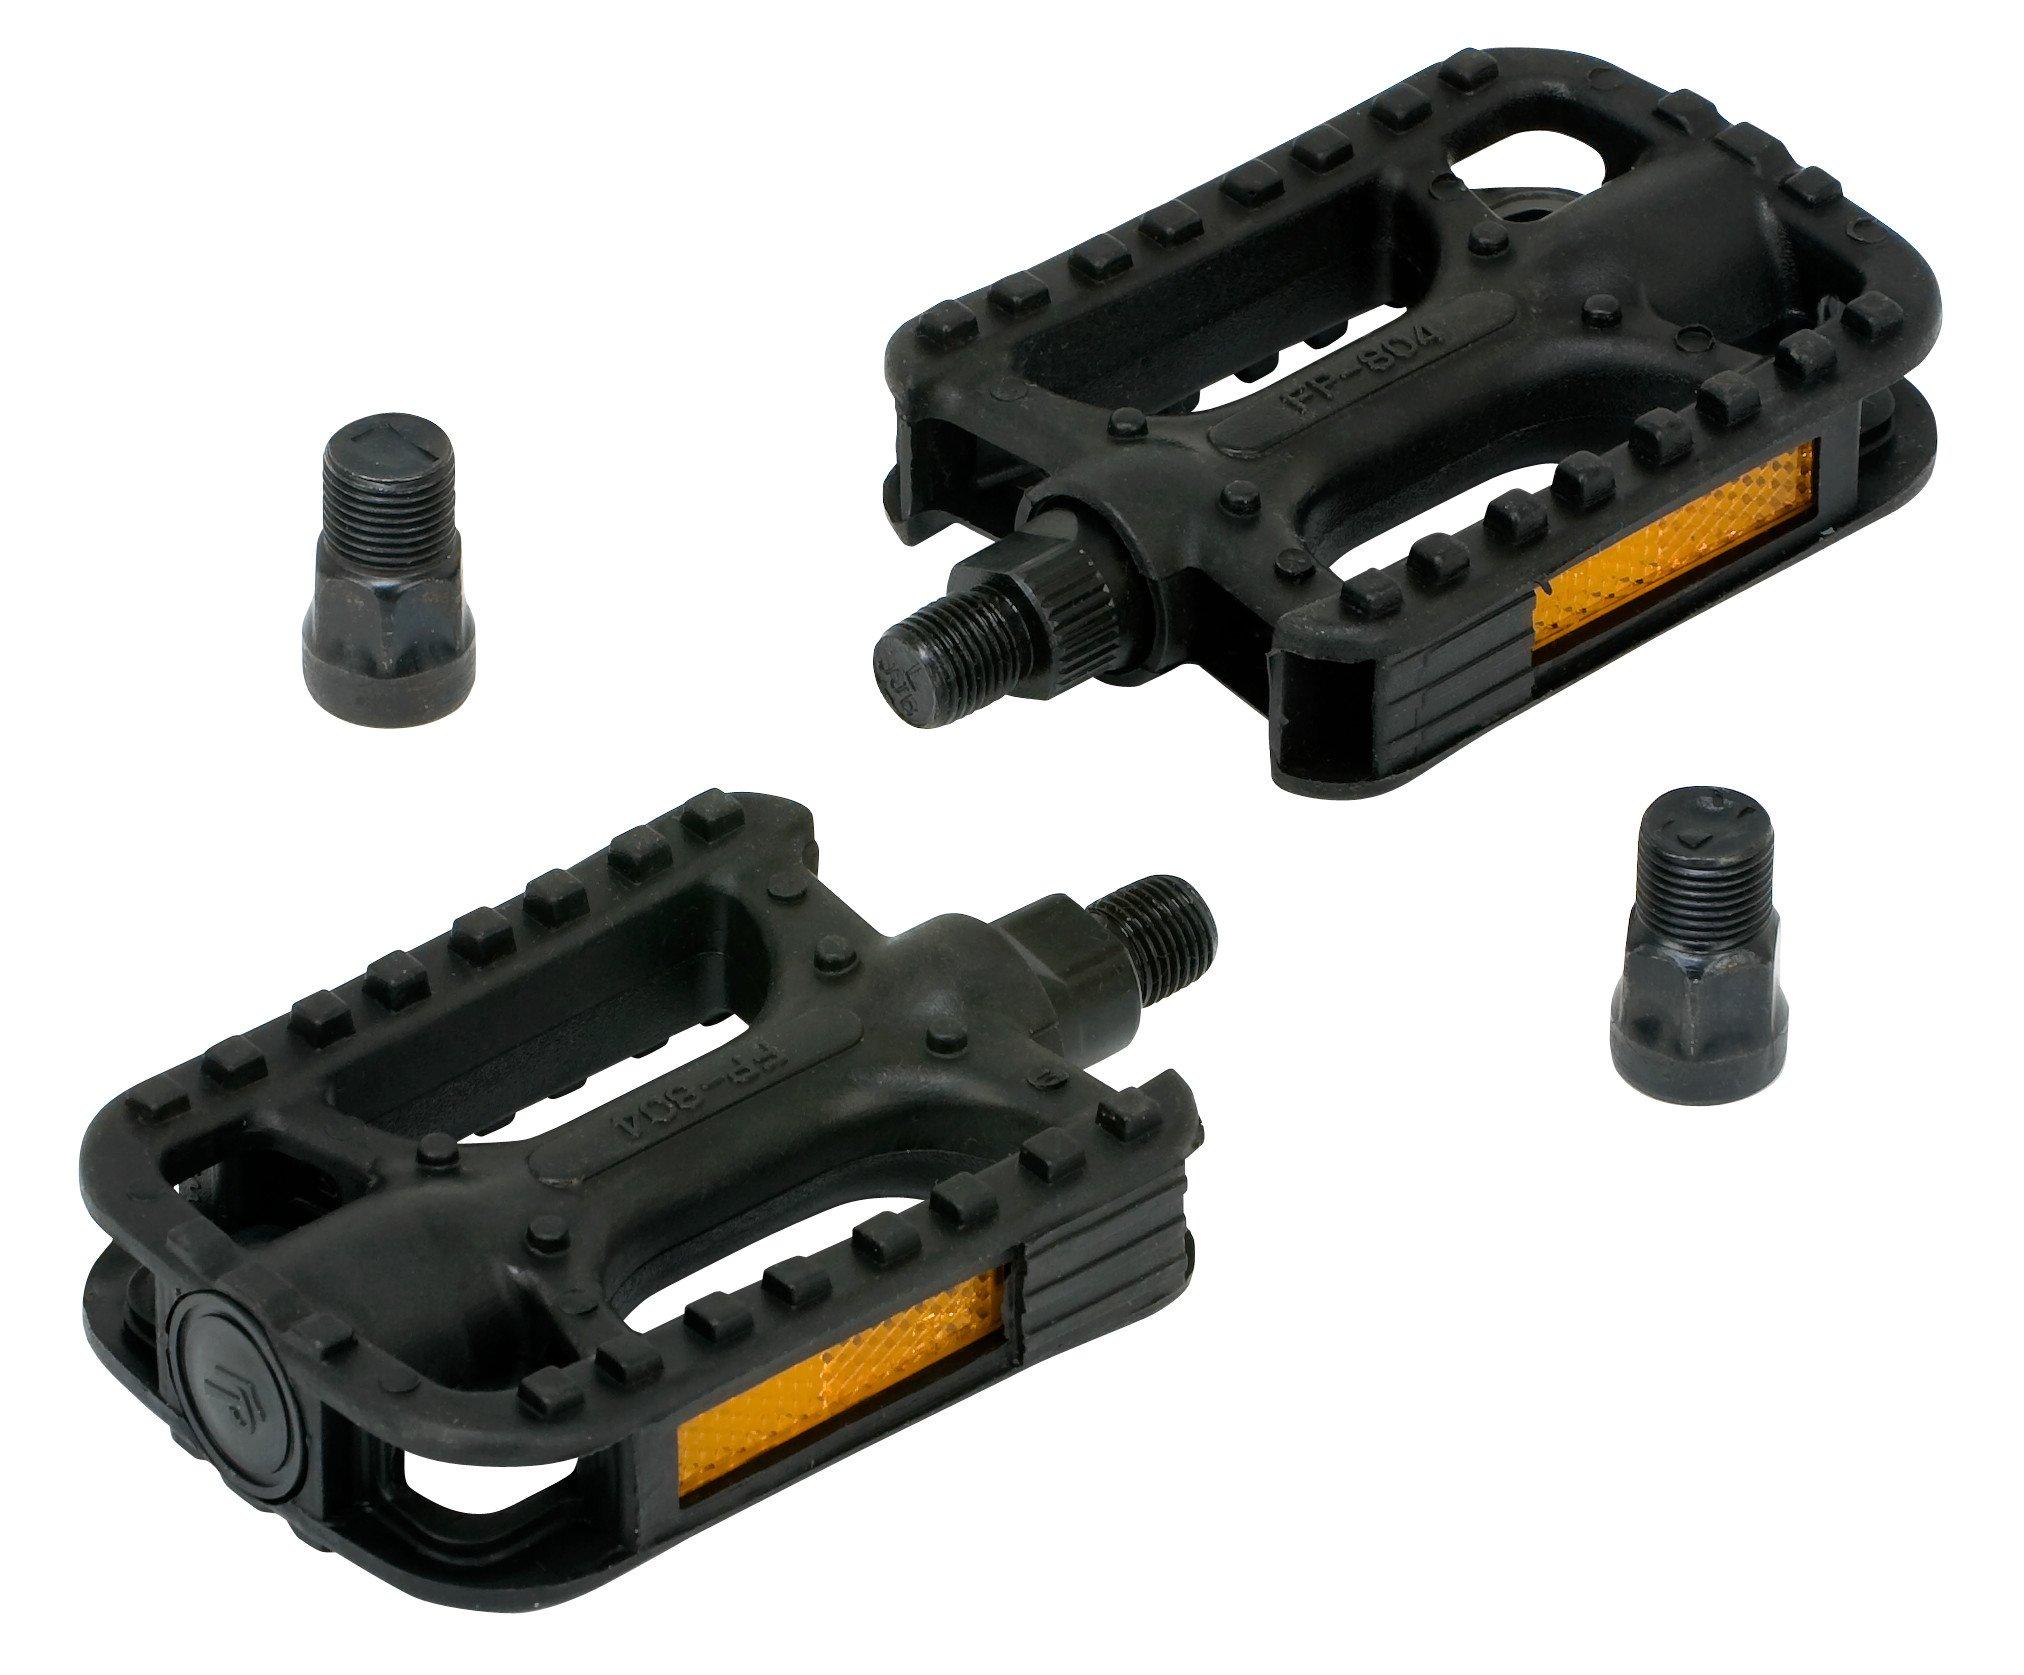 Schwinn SW76173-4 Universal Pedal (1/2 x 9/16-Inch) by Schwinn